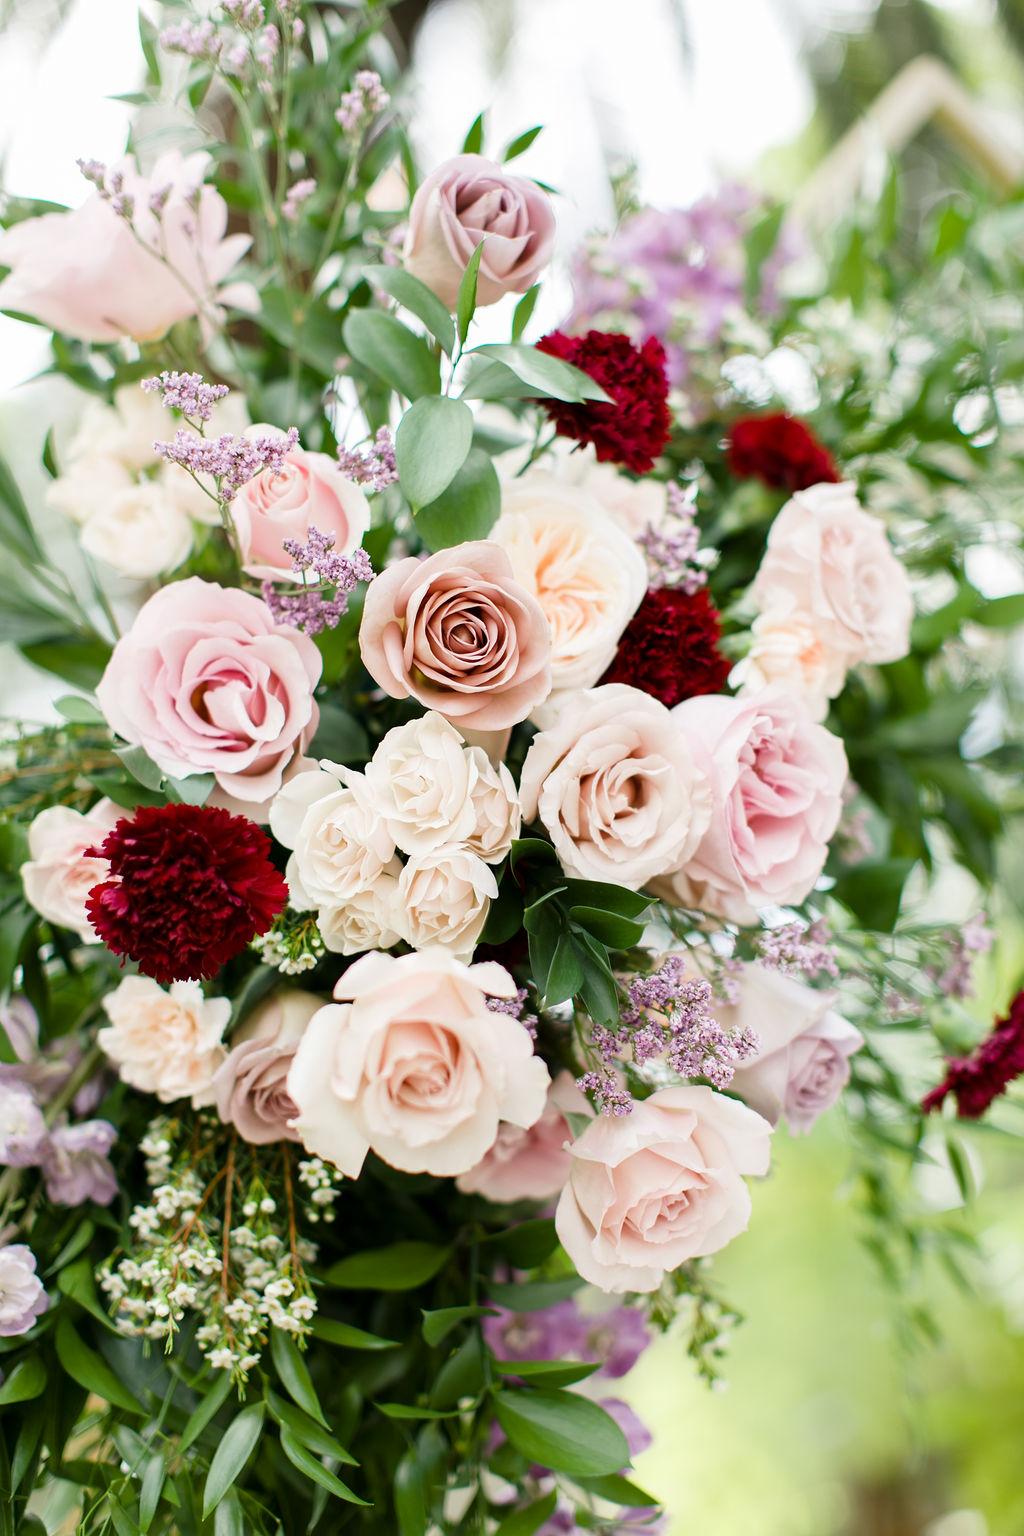 Sav-Flowers-11.jpg